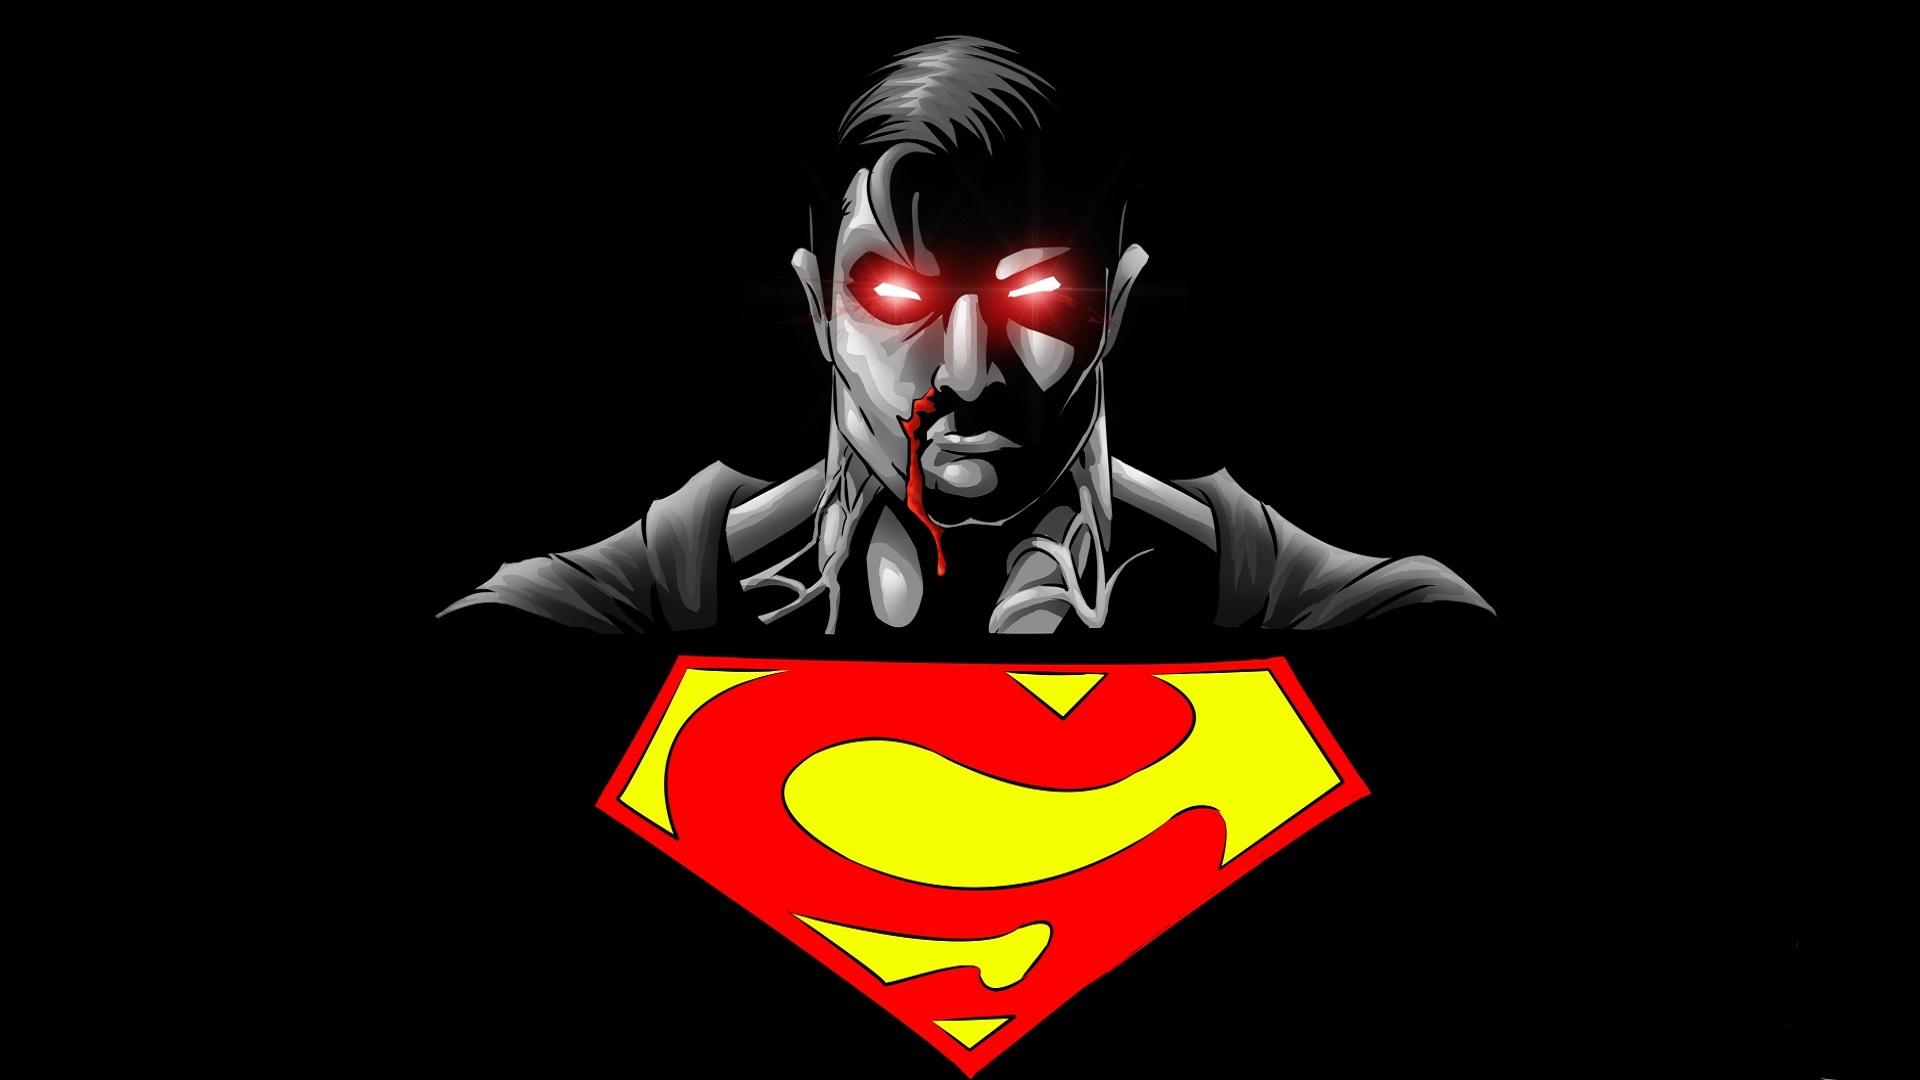 Amazing Wallpaper Halloween Batman - Superman-HD-Wallpaper-for-Desktop-12  Best Photo Reference_878737.jpg